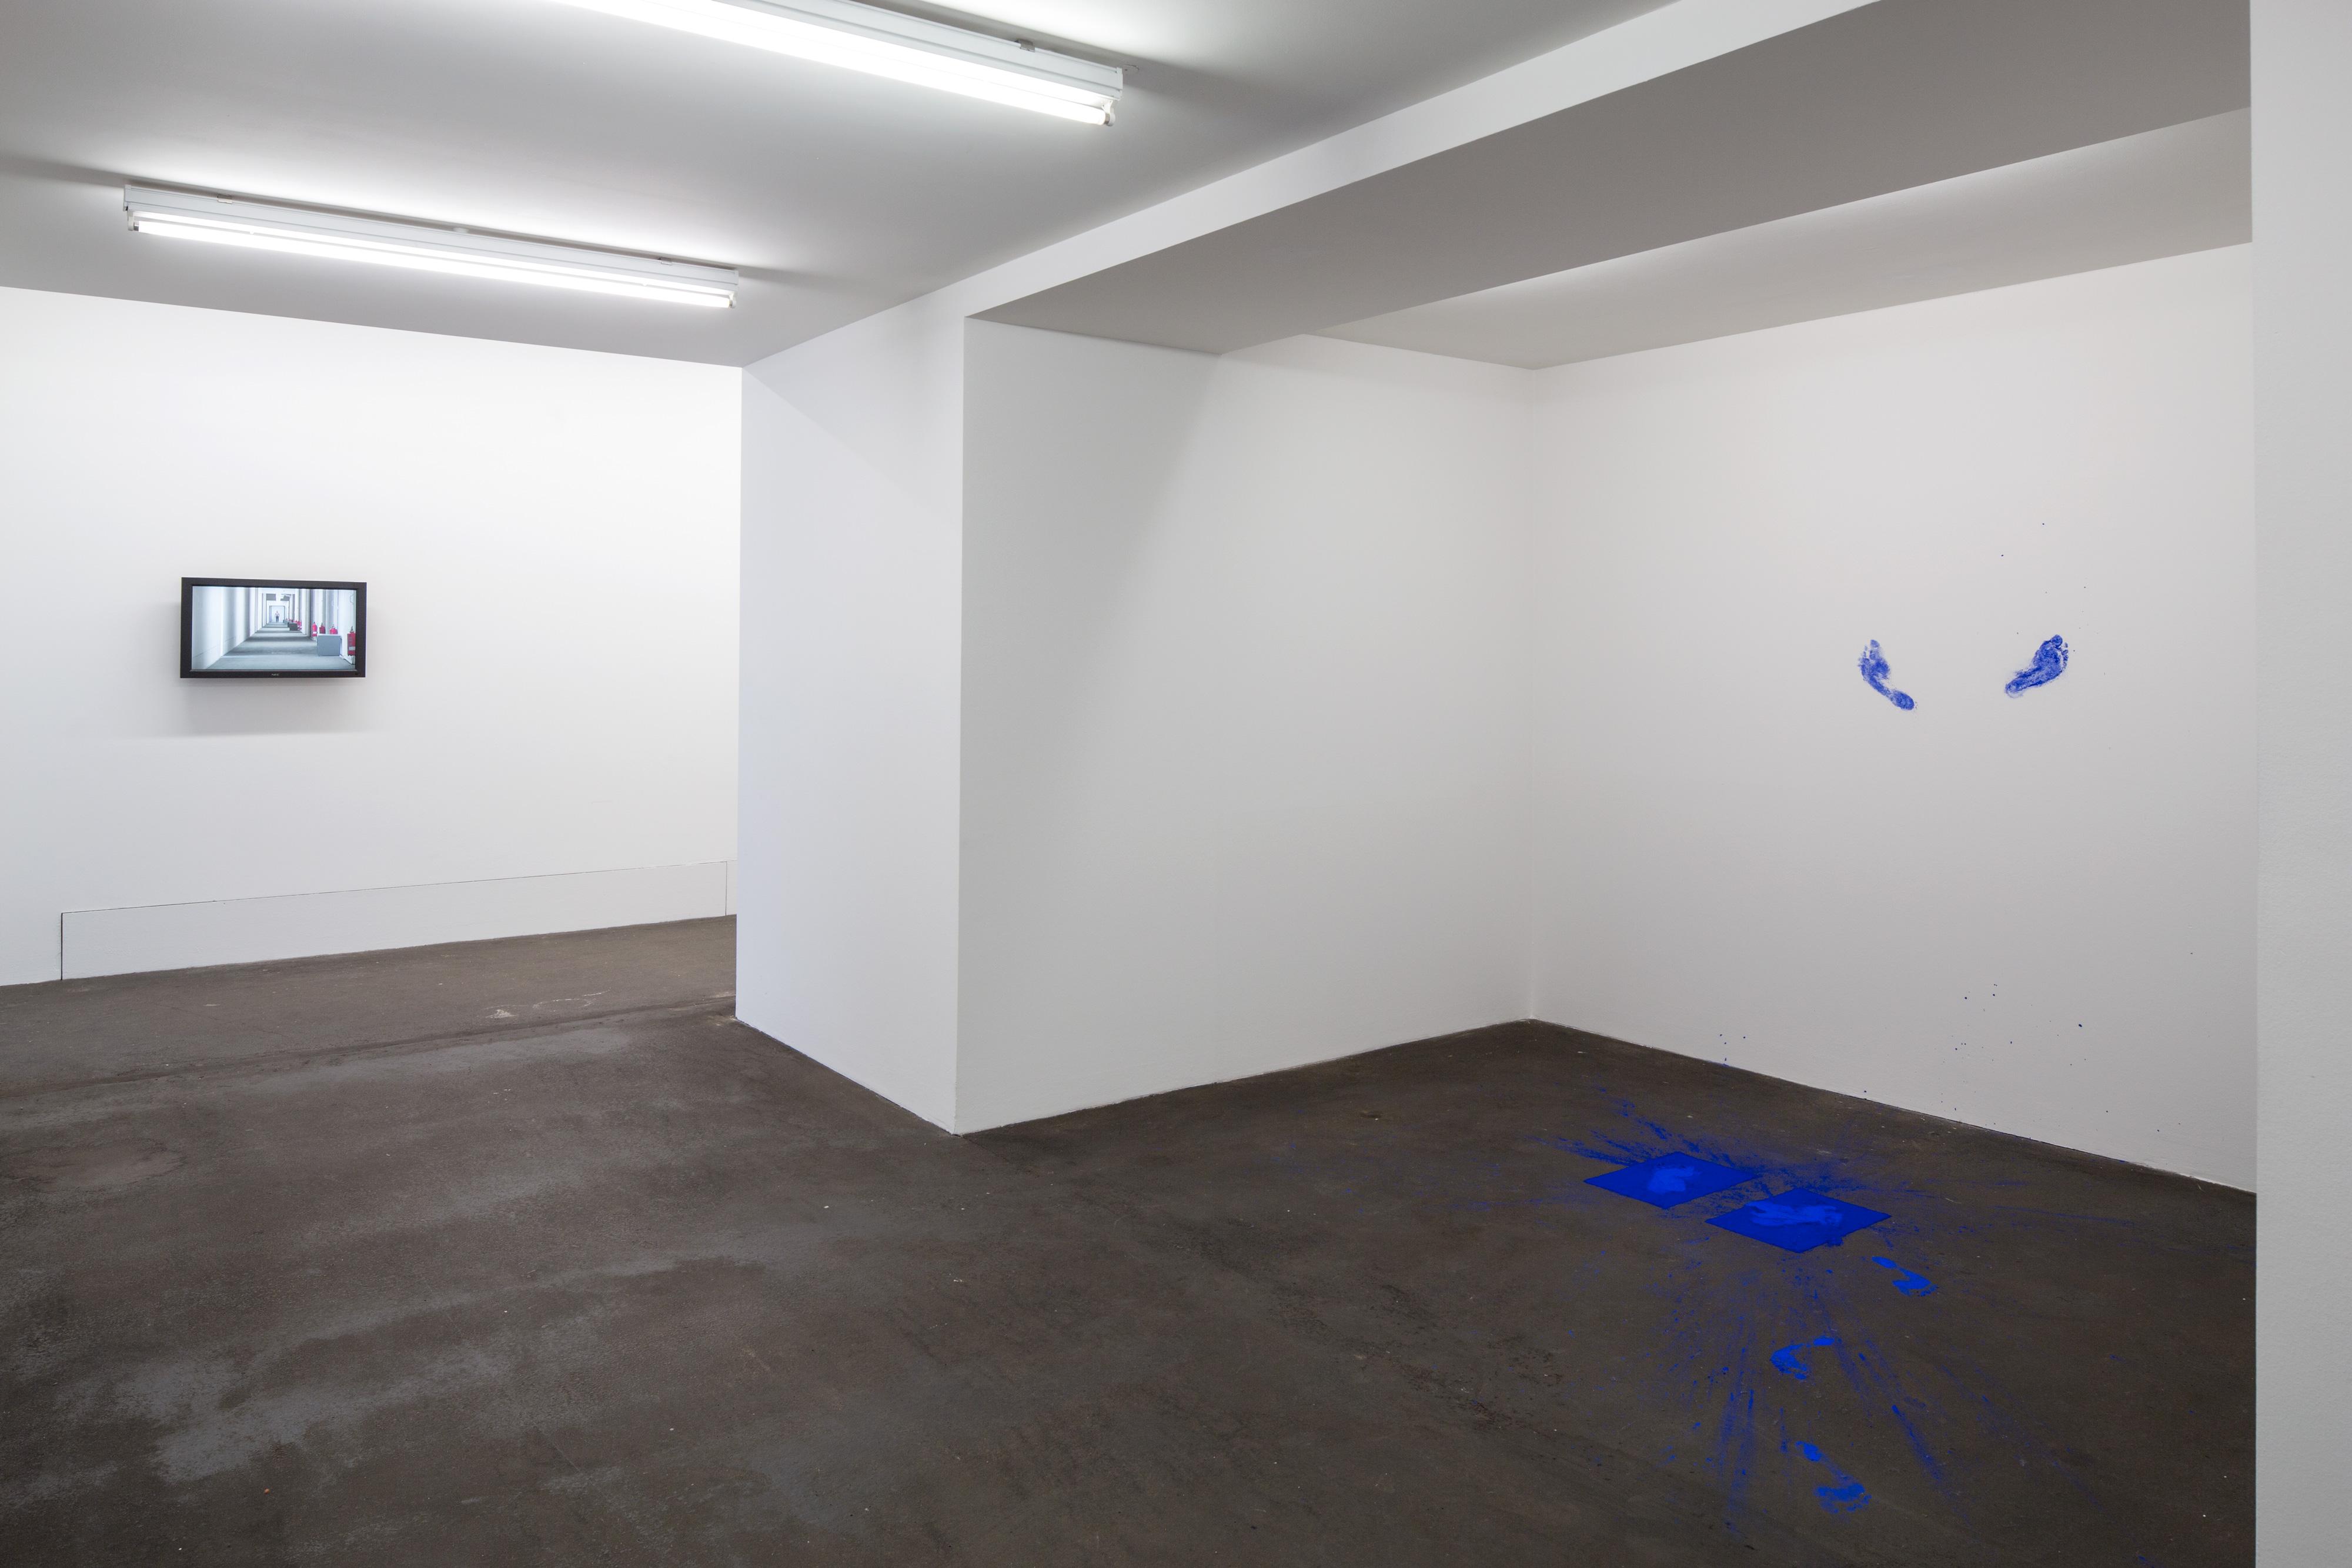 Galerie Barbara Thumm \ Antonio Paucar – Wall Works